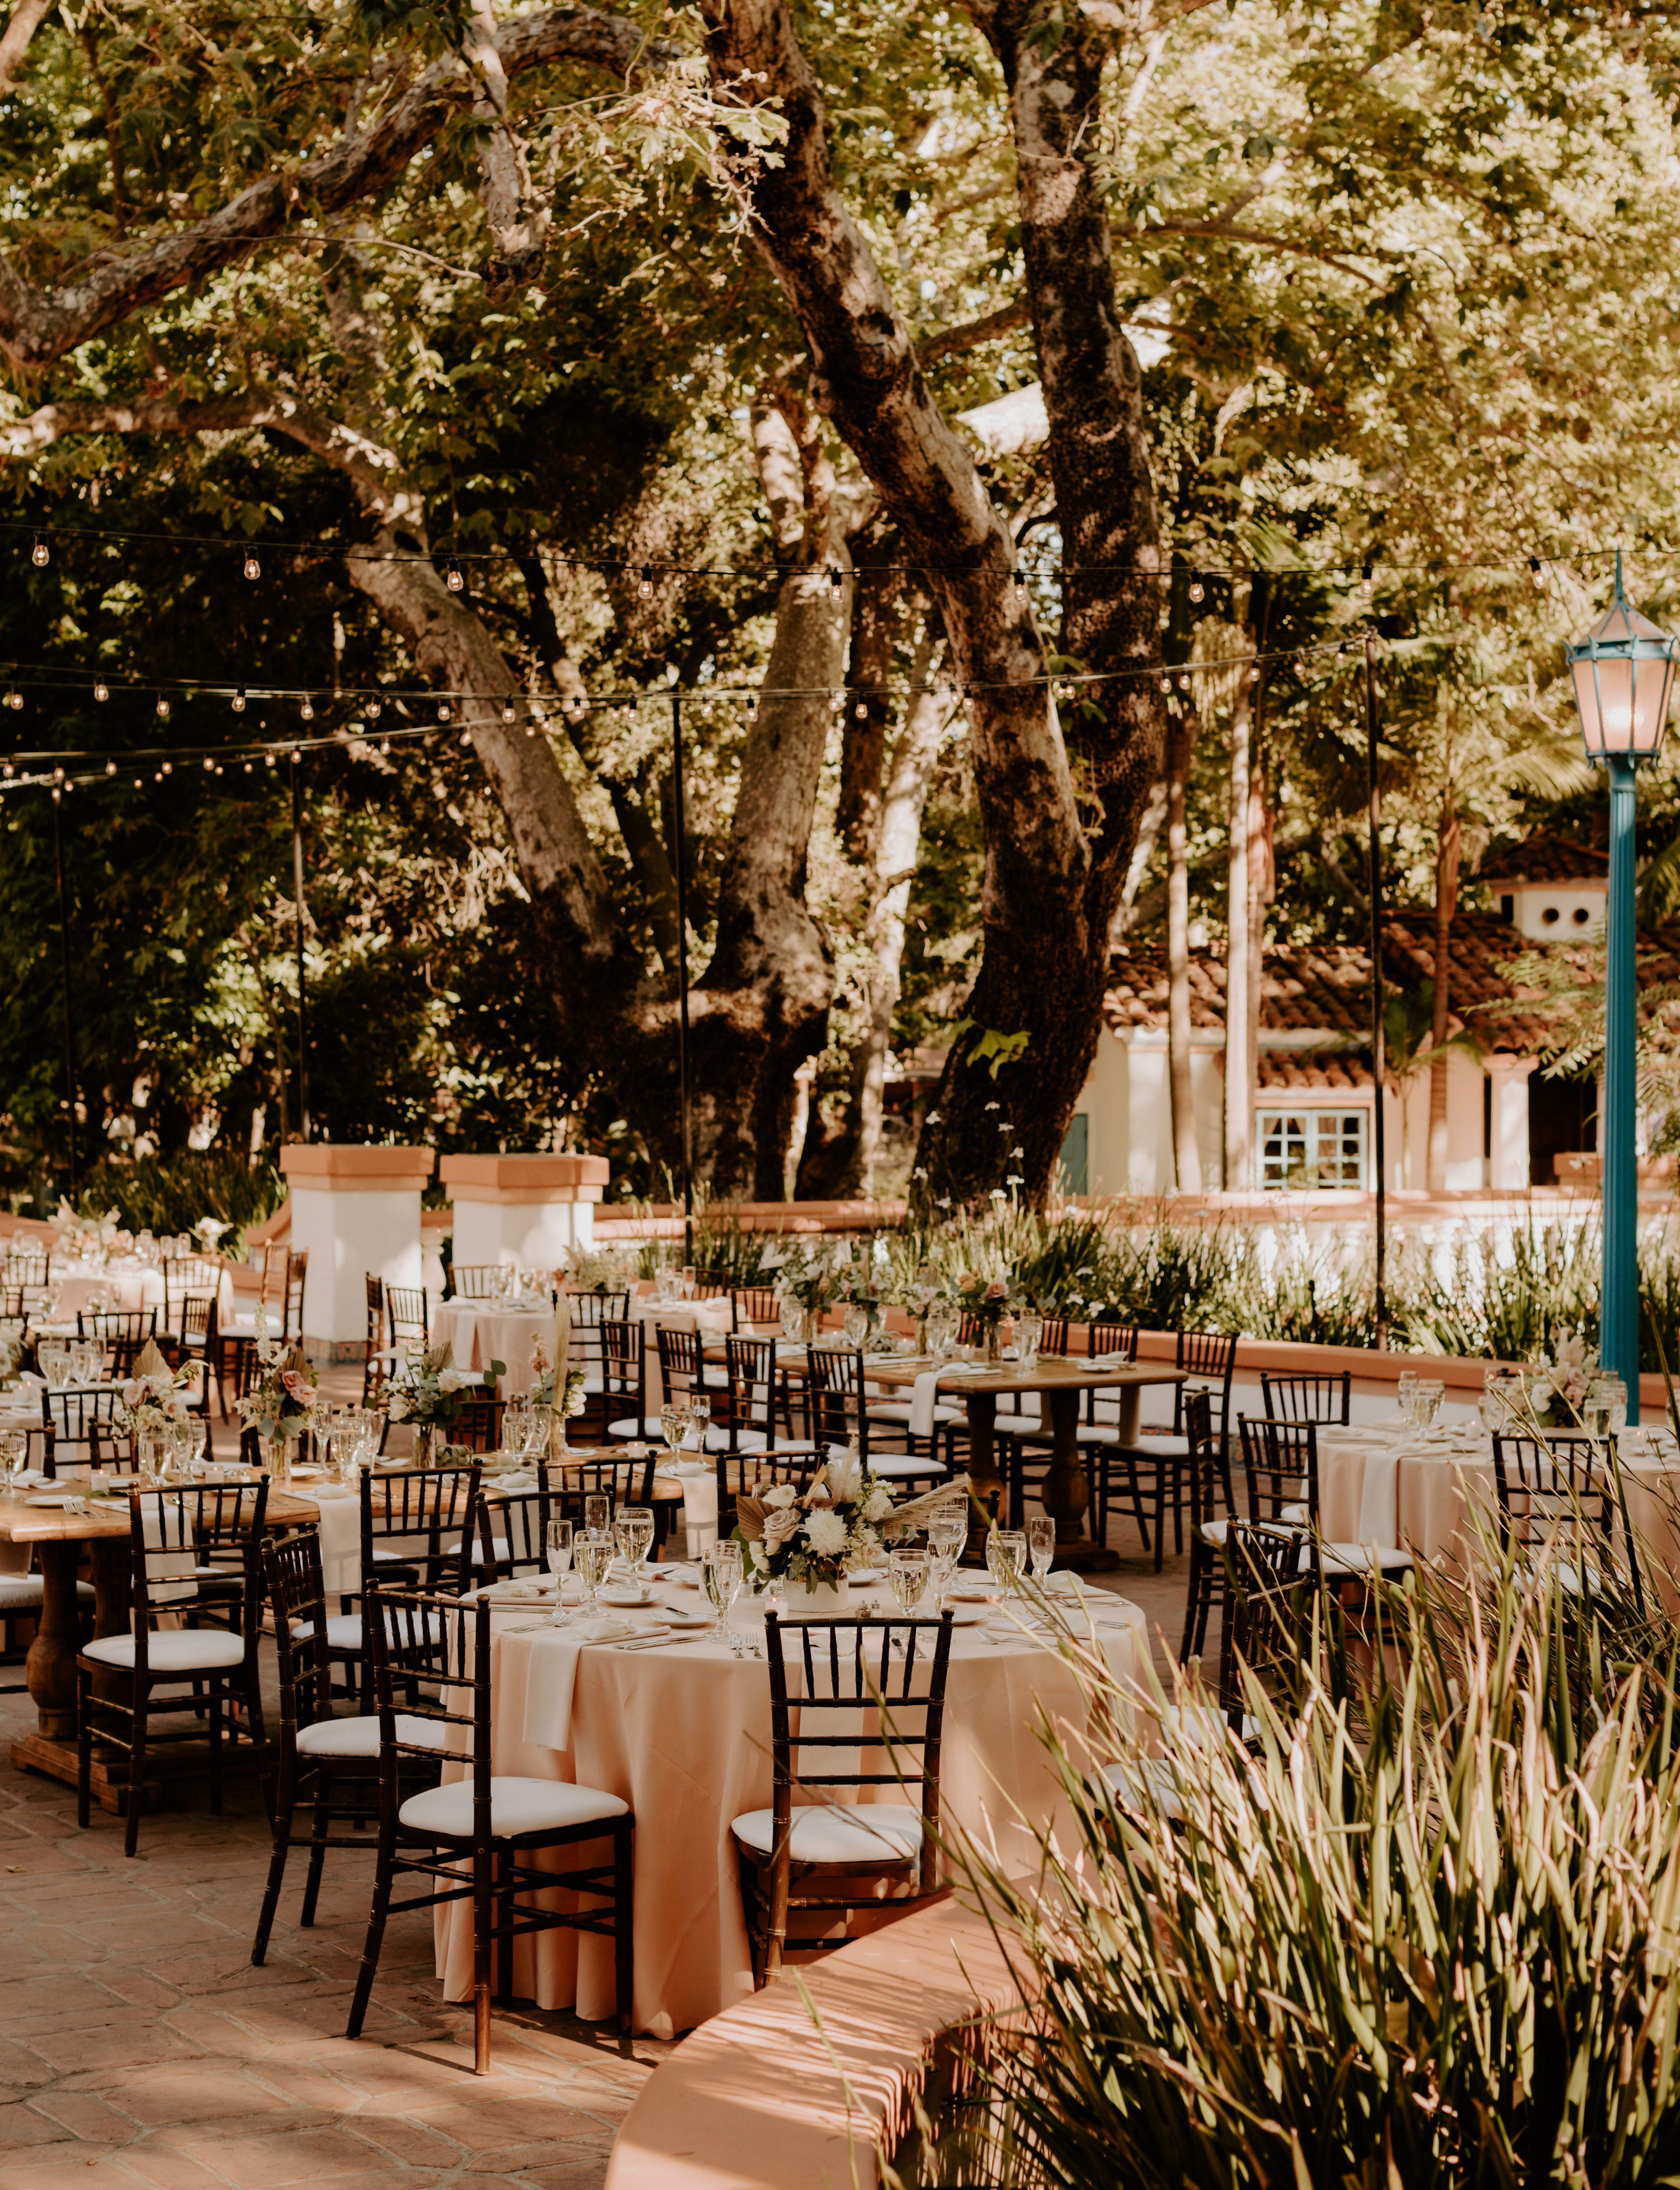 Rancho las lomas wedding reception- Southern california ...